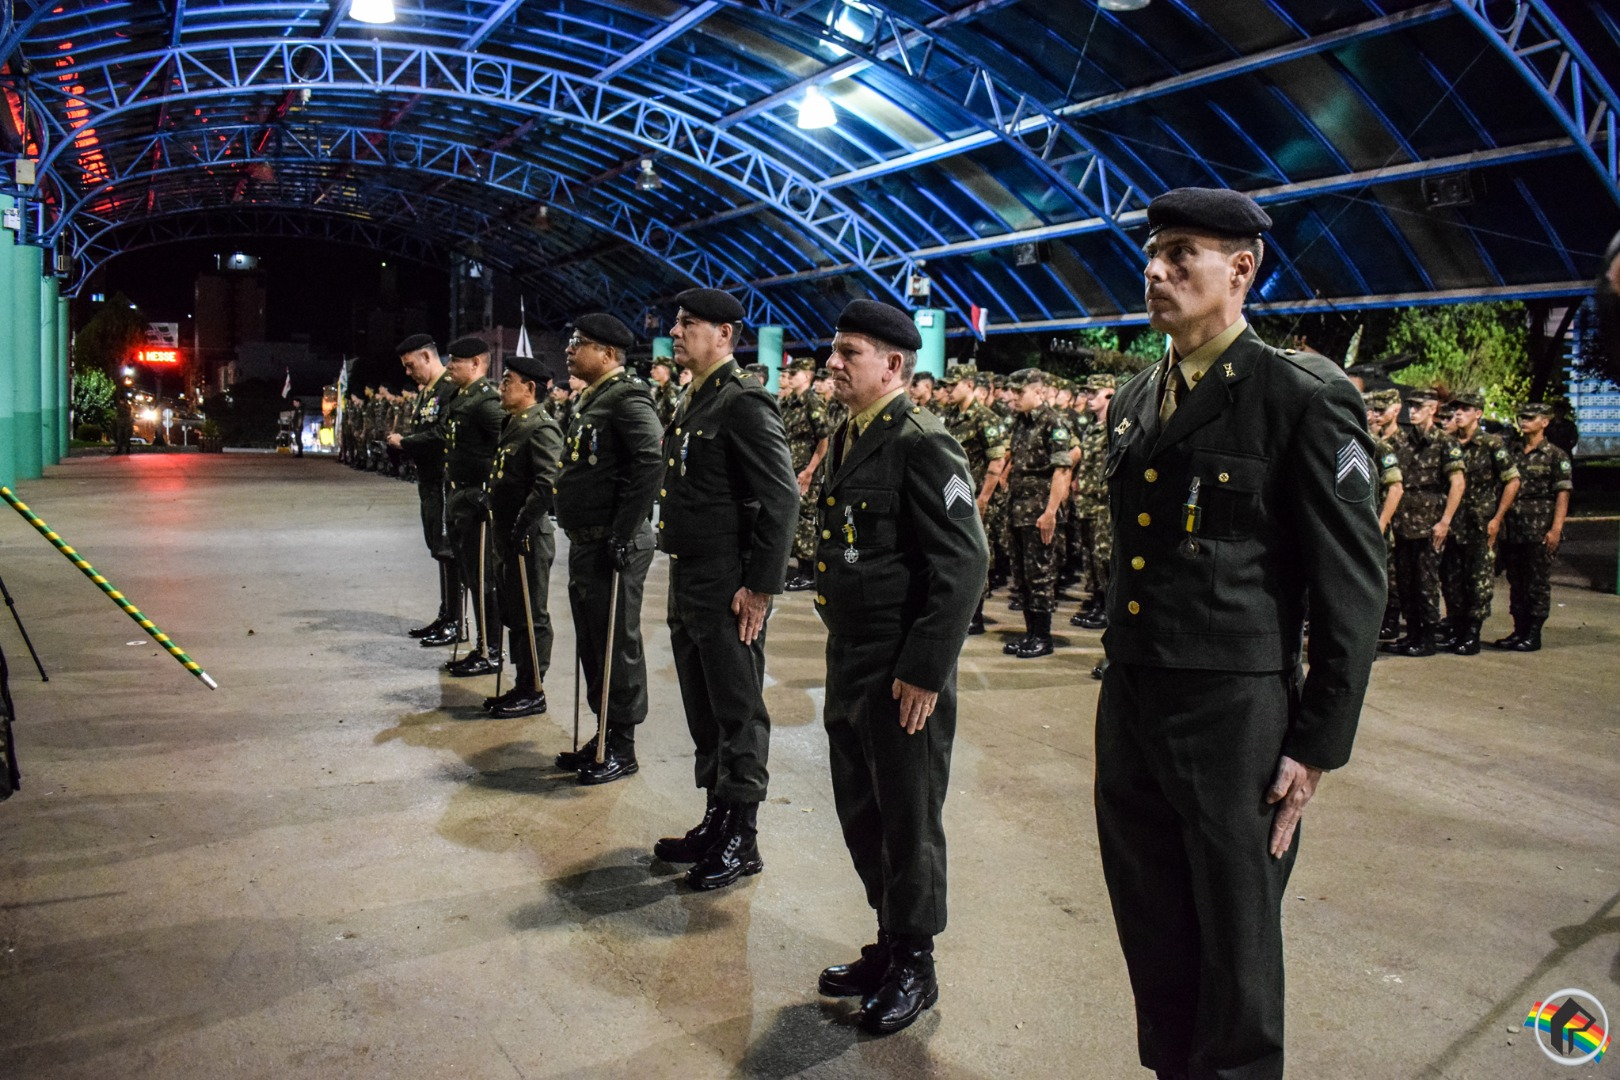 Exército promove formatura alusiva aos 371 anos de existência